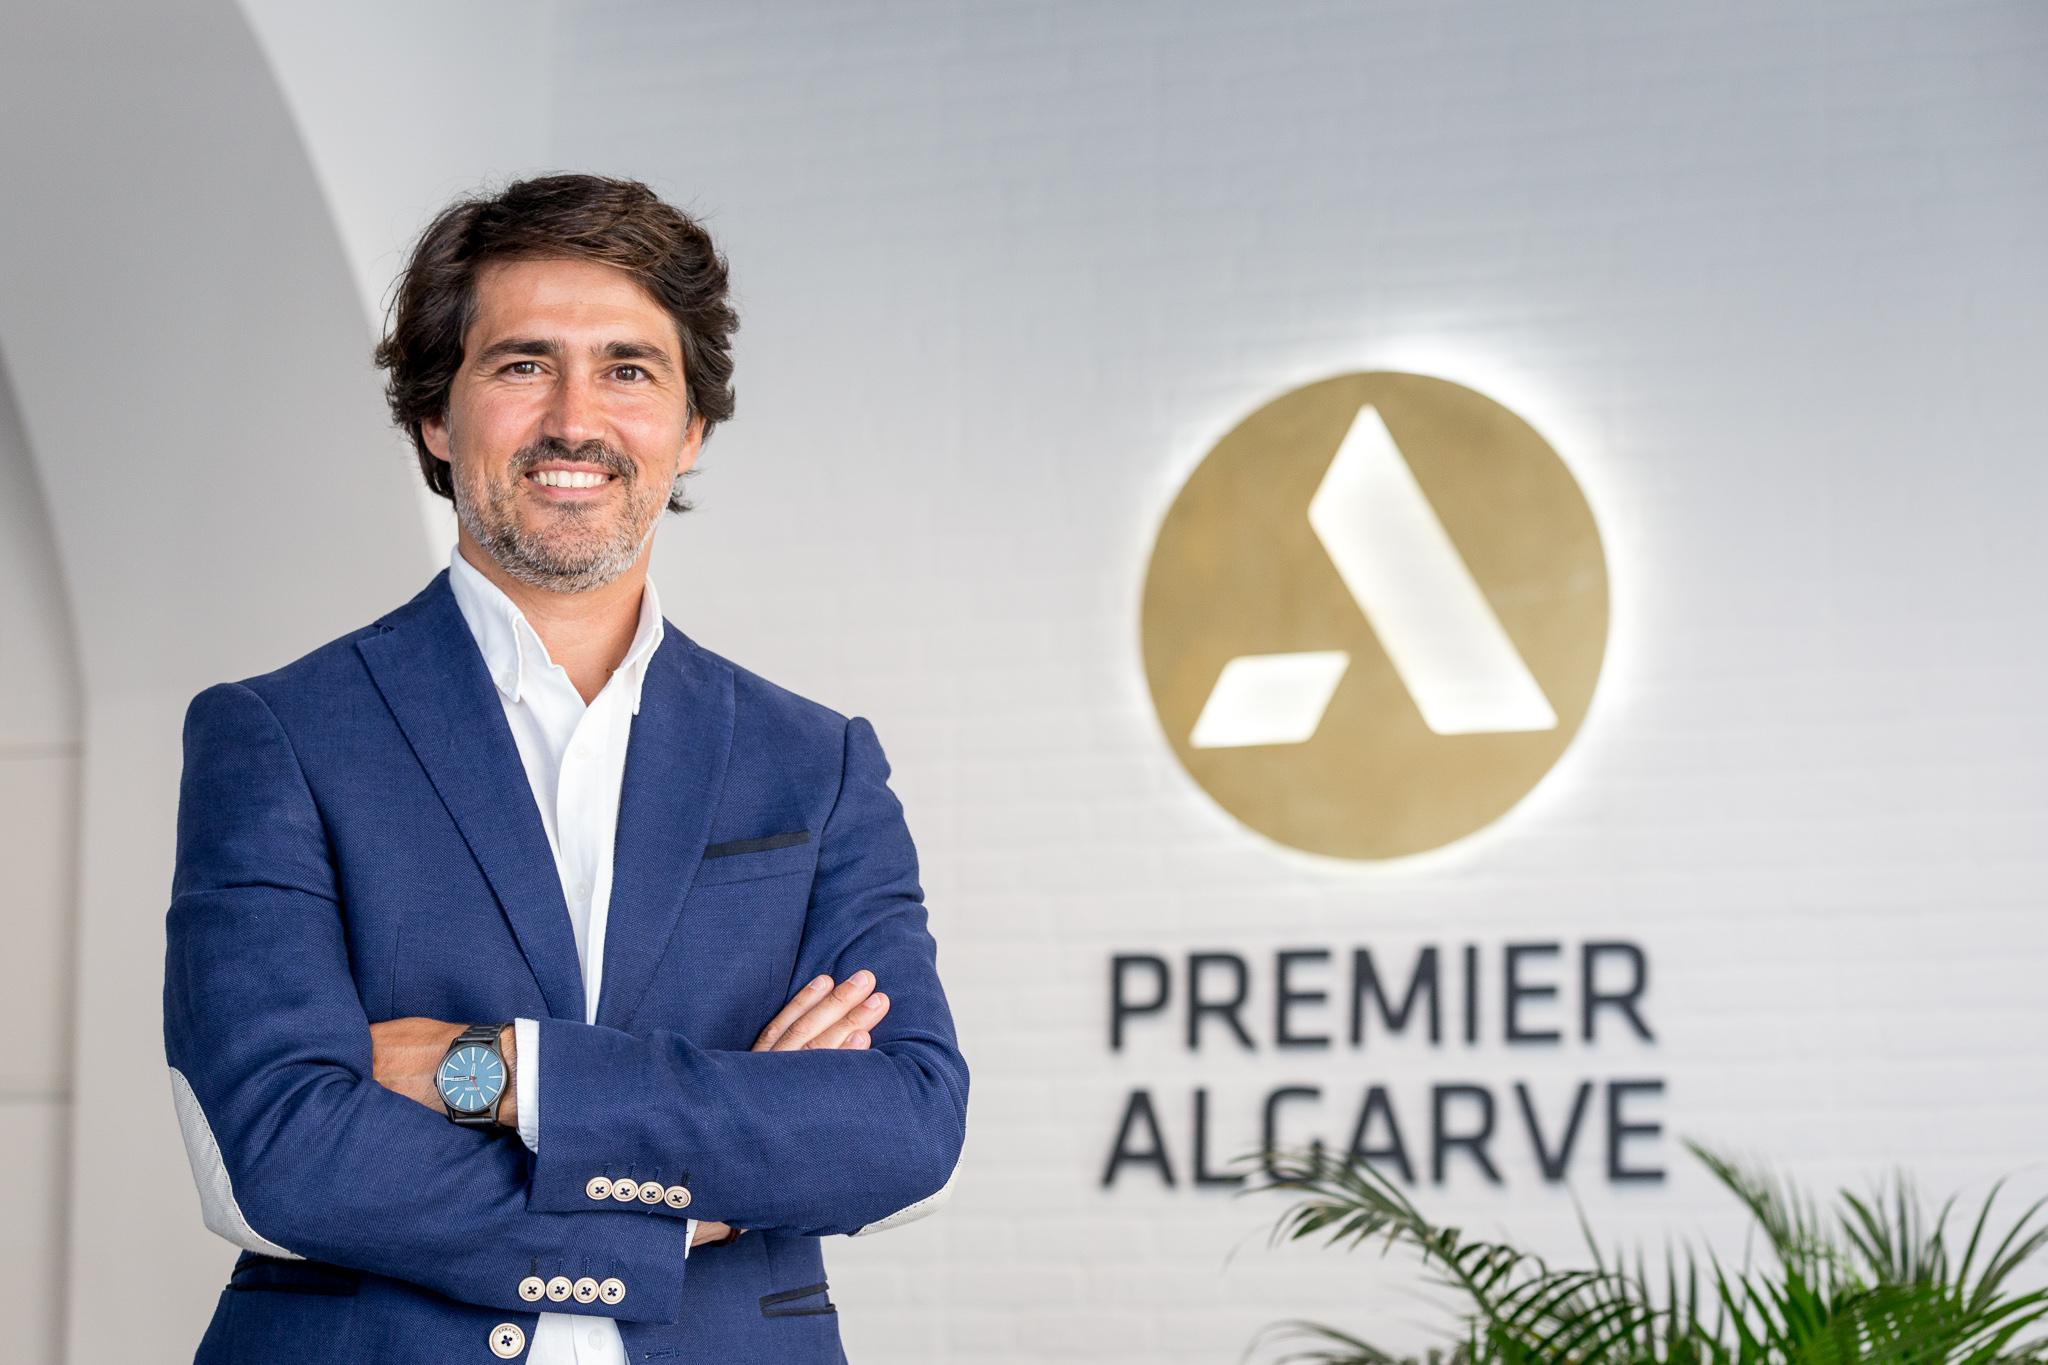 Hélder Mação / Premier Algarve